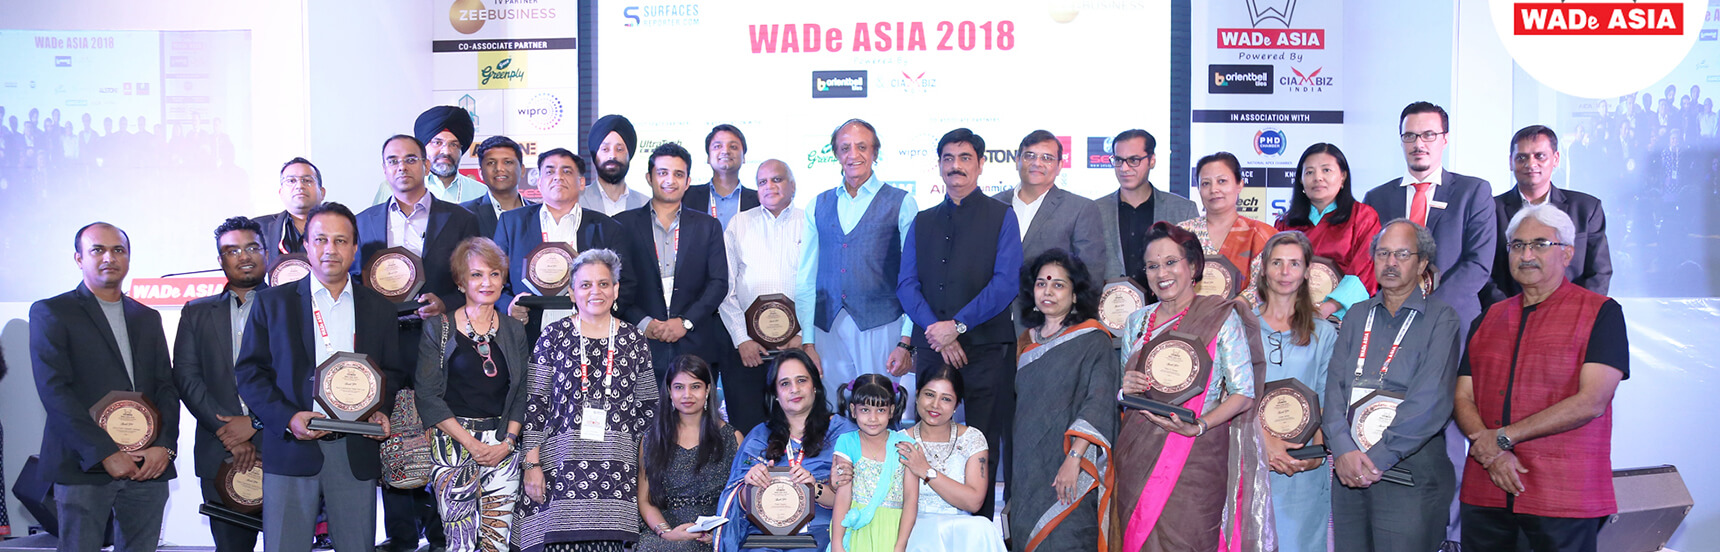 WADe ASIA/India is a prestigious architecture & design event of India